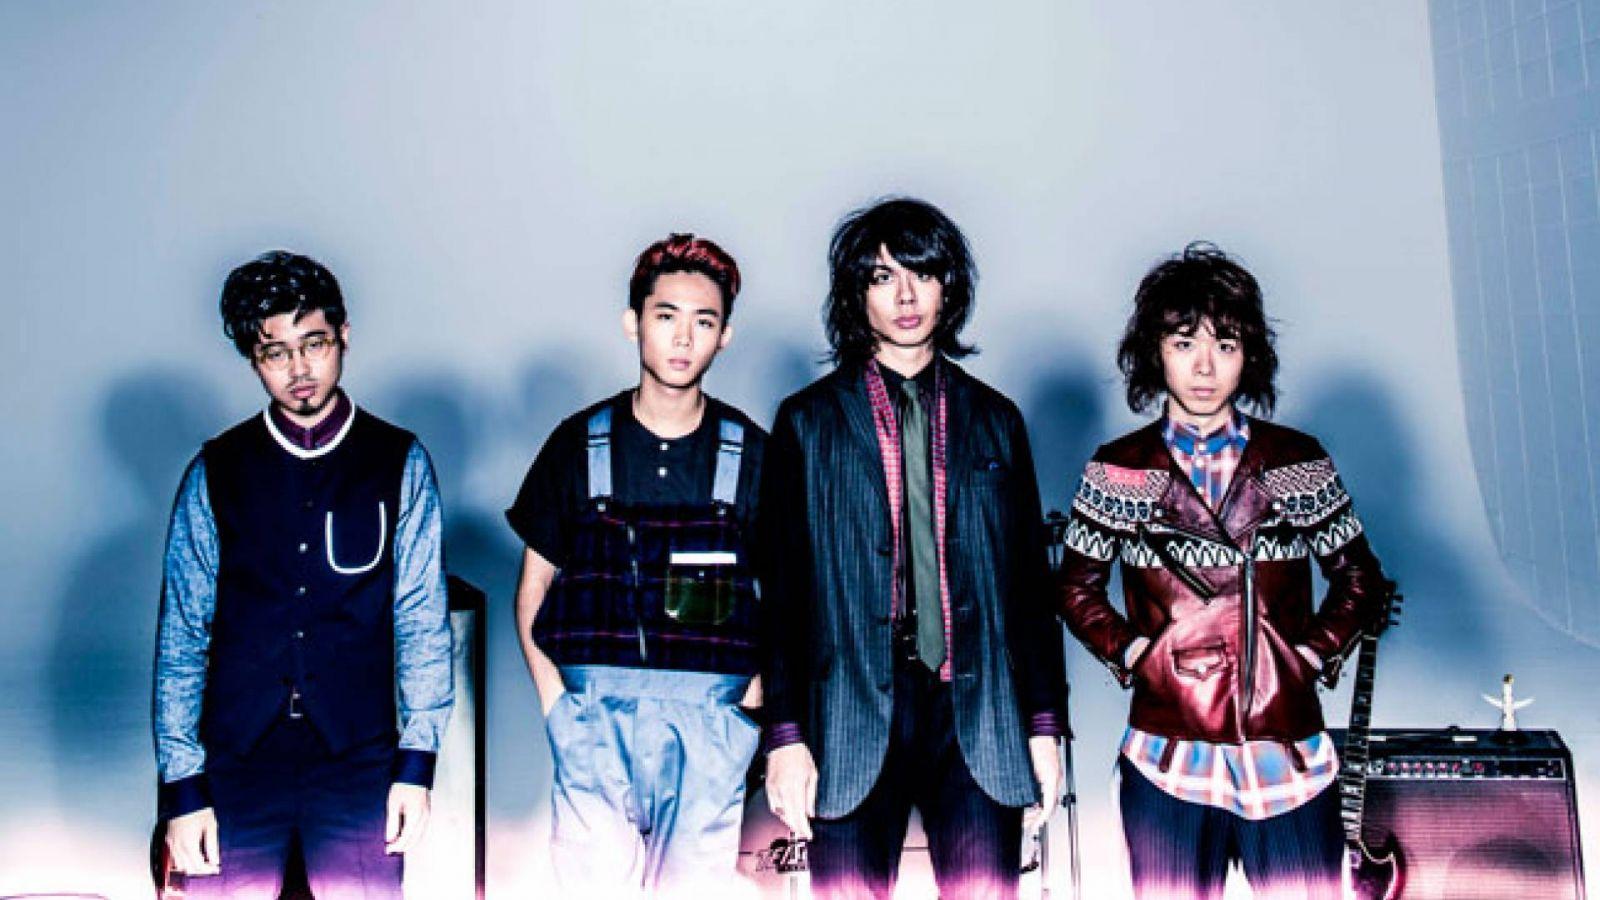 Новый сингл OKAMOTO'S © 2015 Sony Music Artists Inc. All rights reserved.